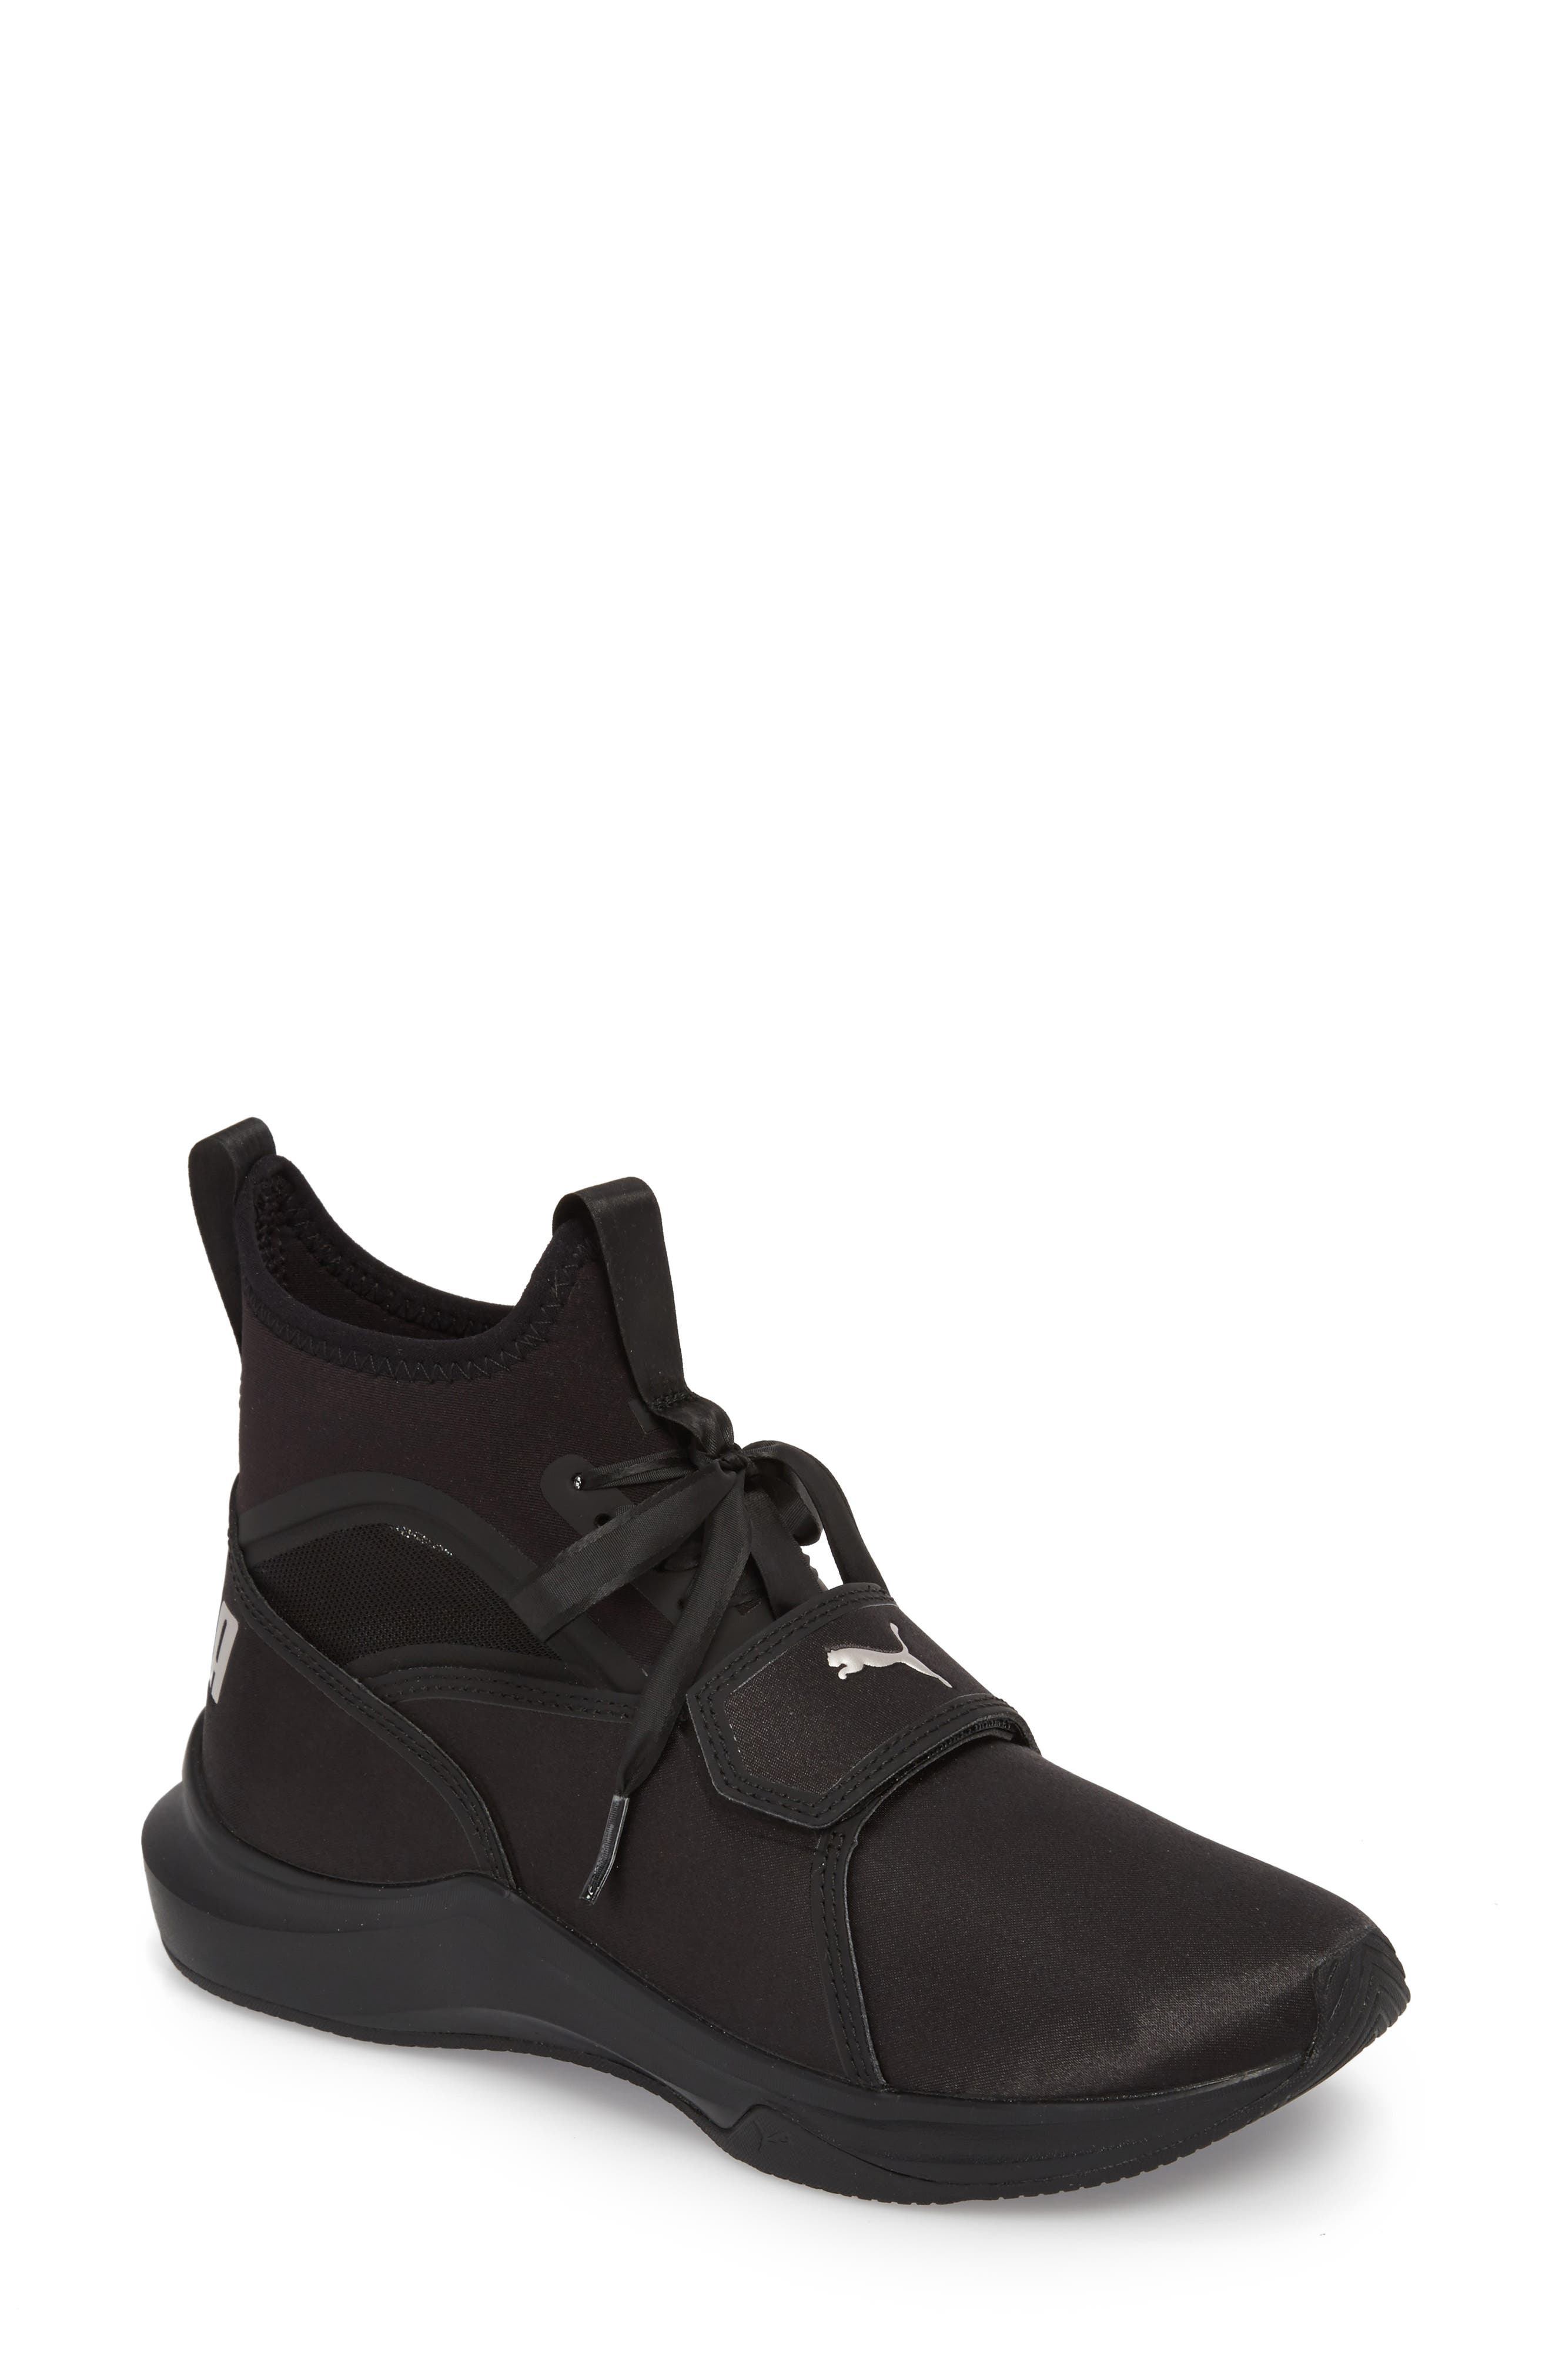 Phenom Satin EP High Top Training Shoe,                             Main thumbnail 1, color,                             Puma Black/ Puma Black